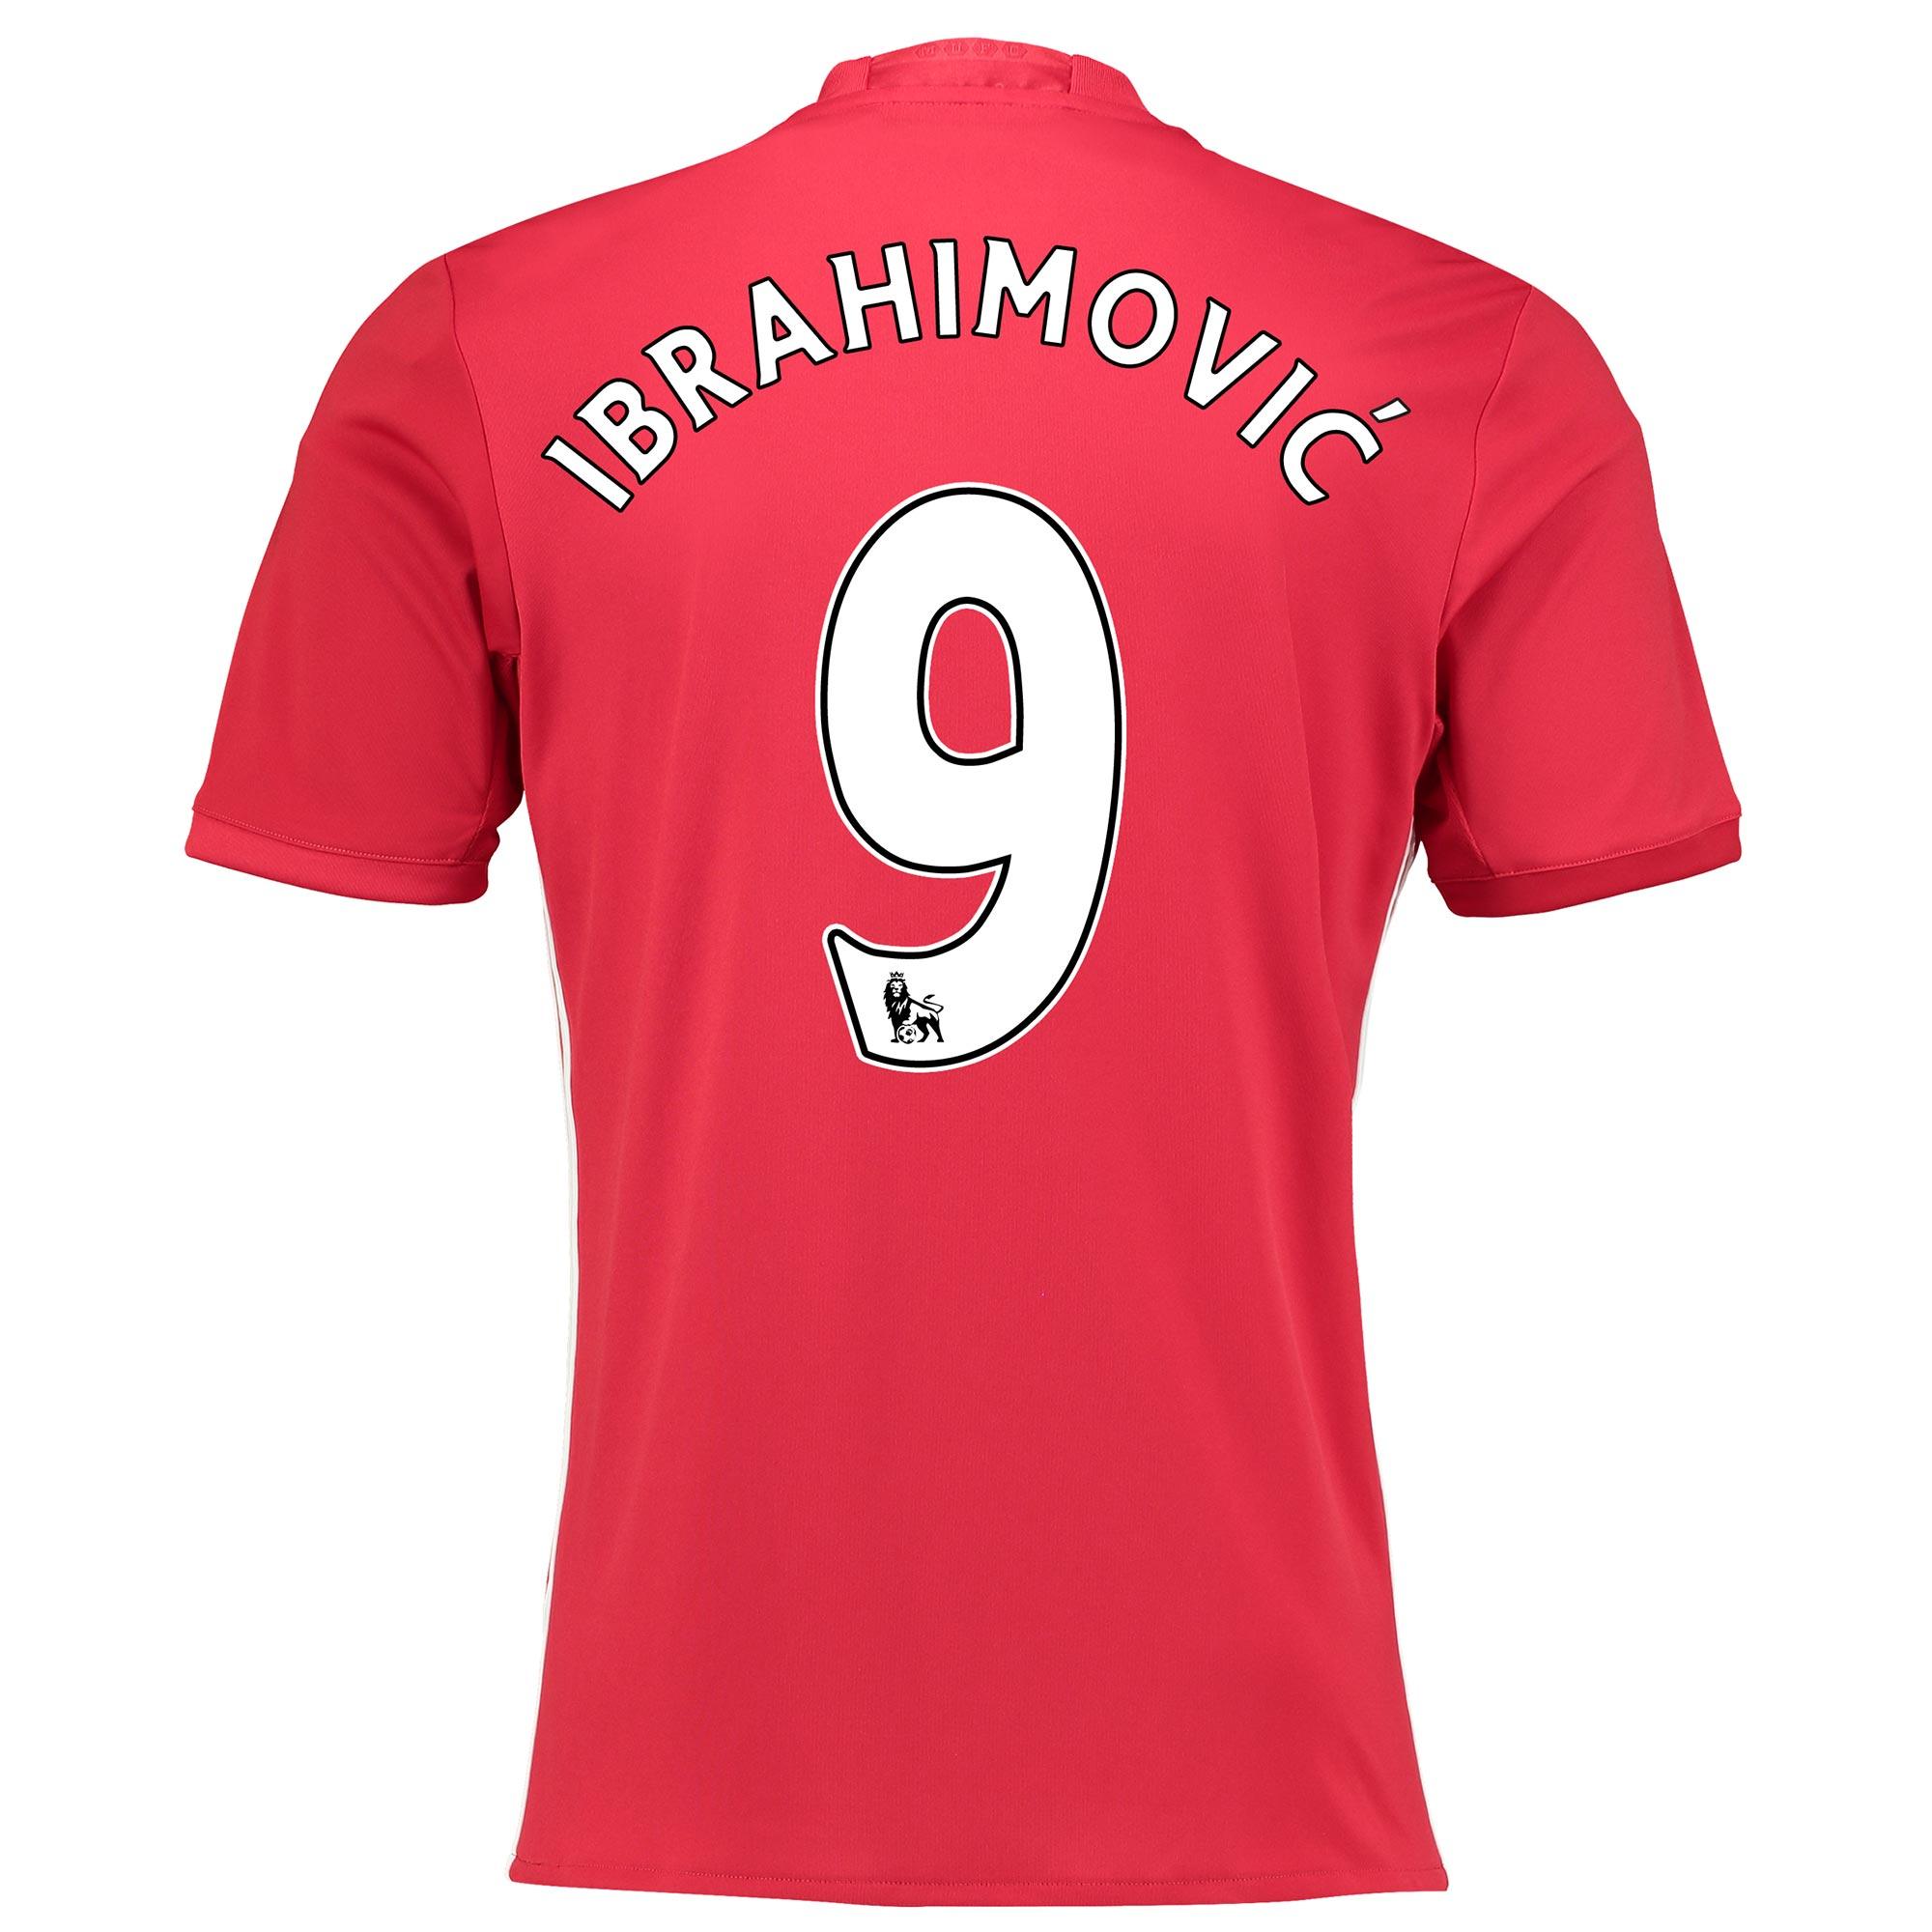 Manchester United Home Shirt 2016-17 with Ibrahimovic 9 printing